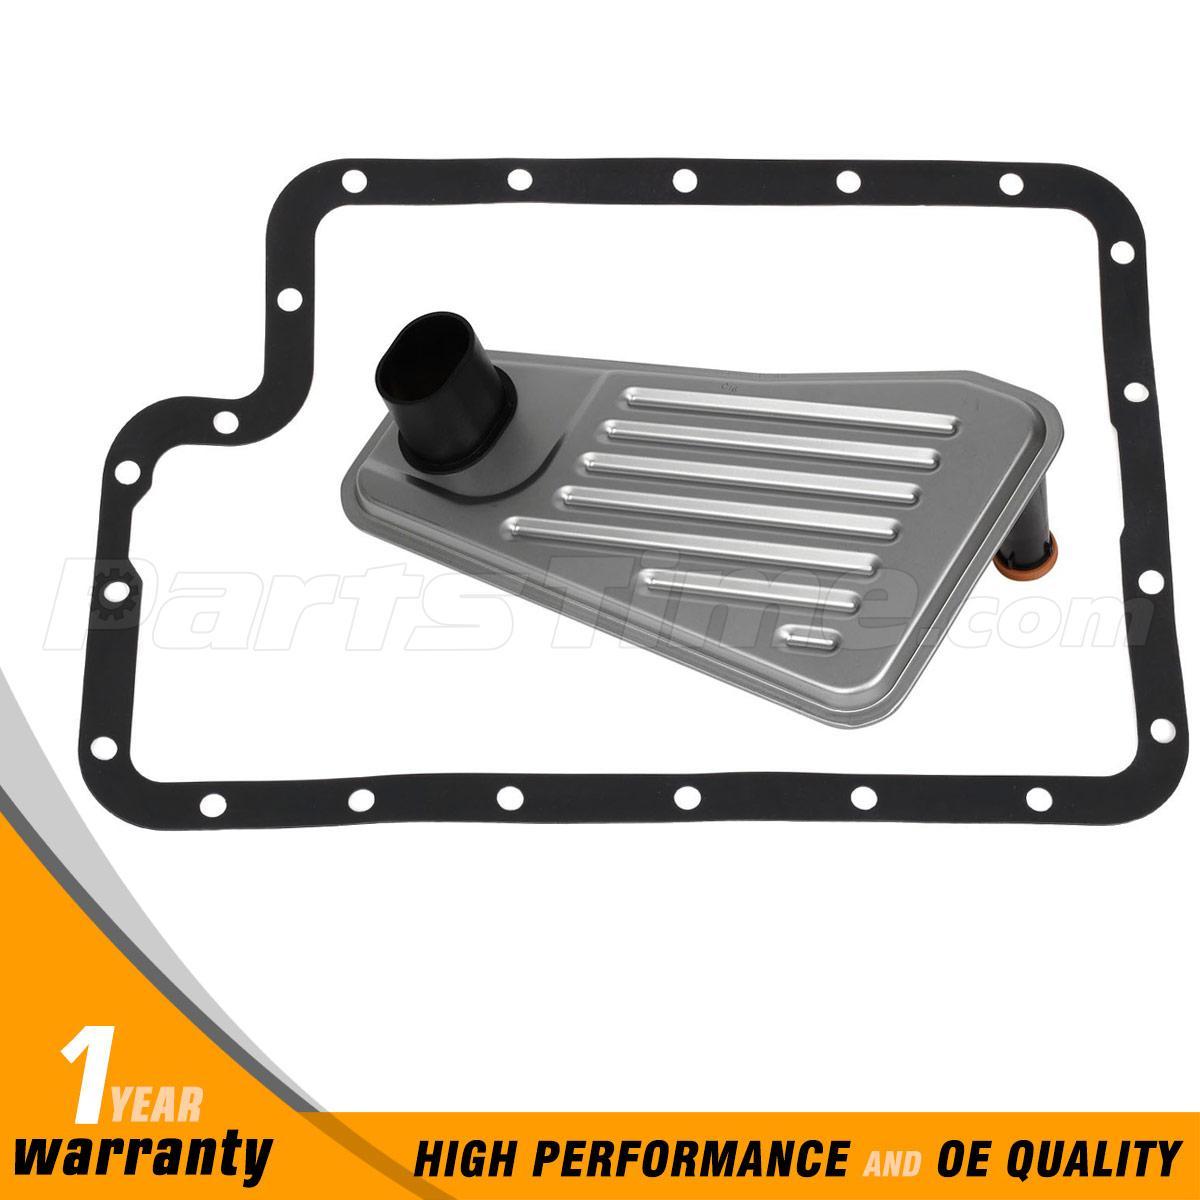 hight resolution of 5r110 wire harness manual guide wiring diagram u2022 rh lancairforum com 5r110 pan 5r110 pan